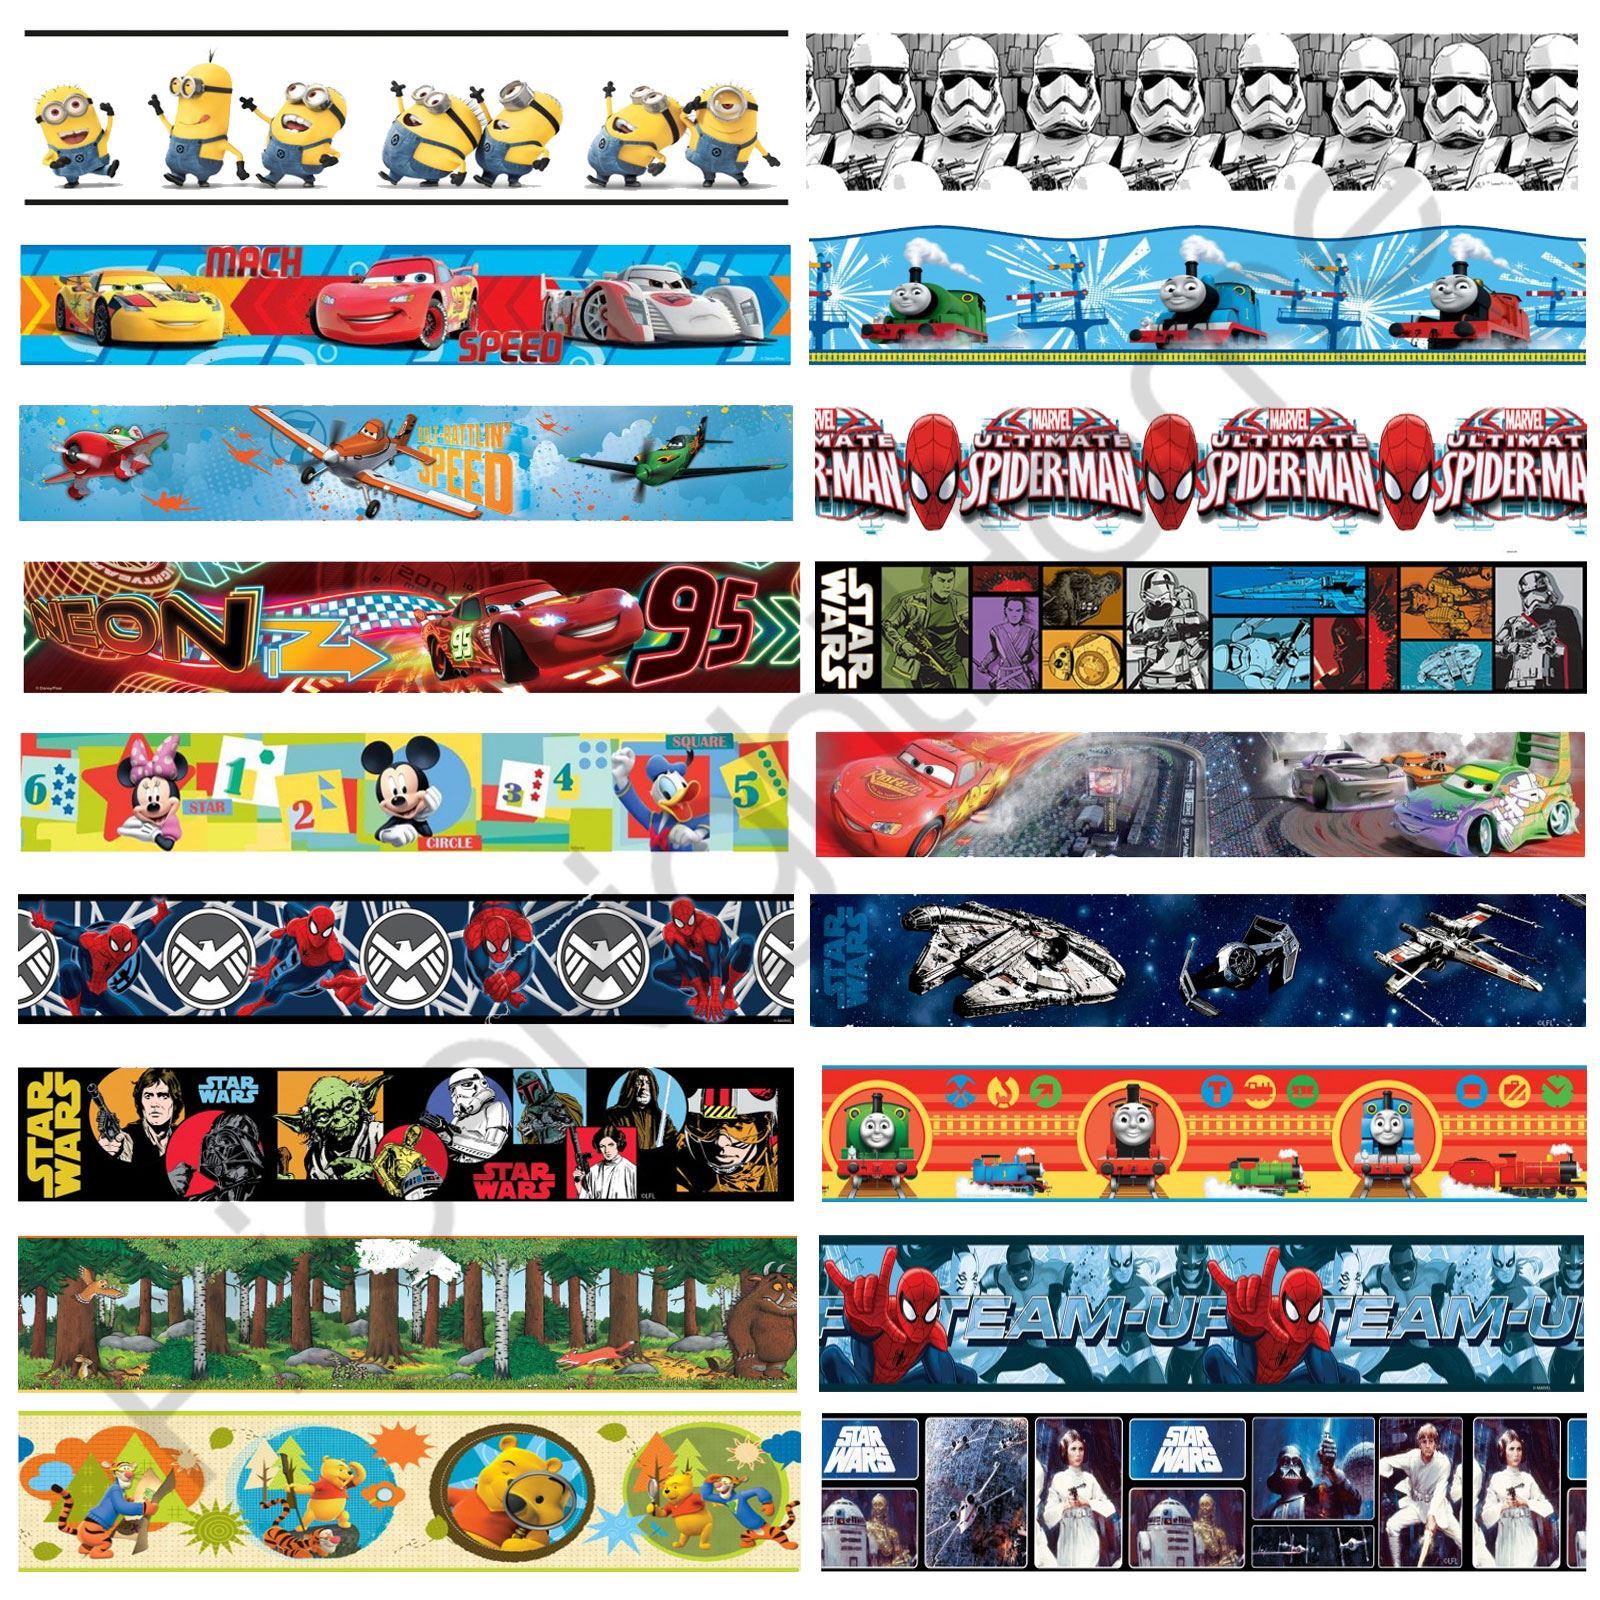 Thomas The Tank Engine Wall Stickers Boys Character Self Adhesive Wallpaper Borders Star Wars